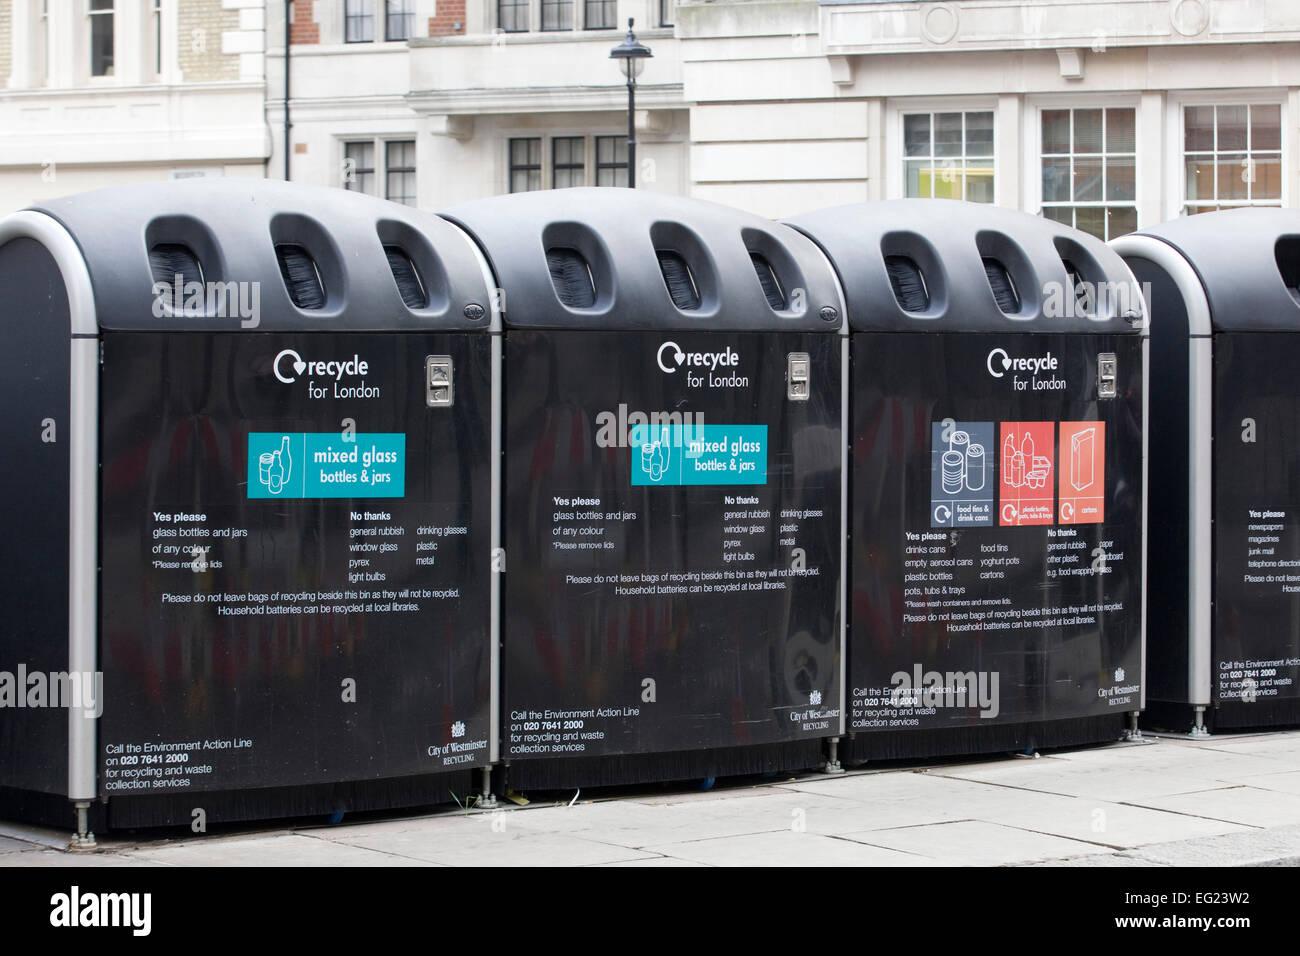 Keep Britain tidy recycling bins London - Stock Image